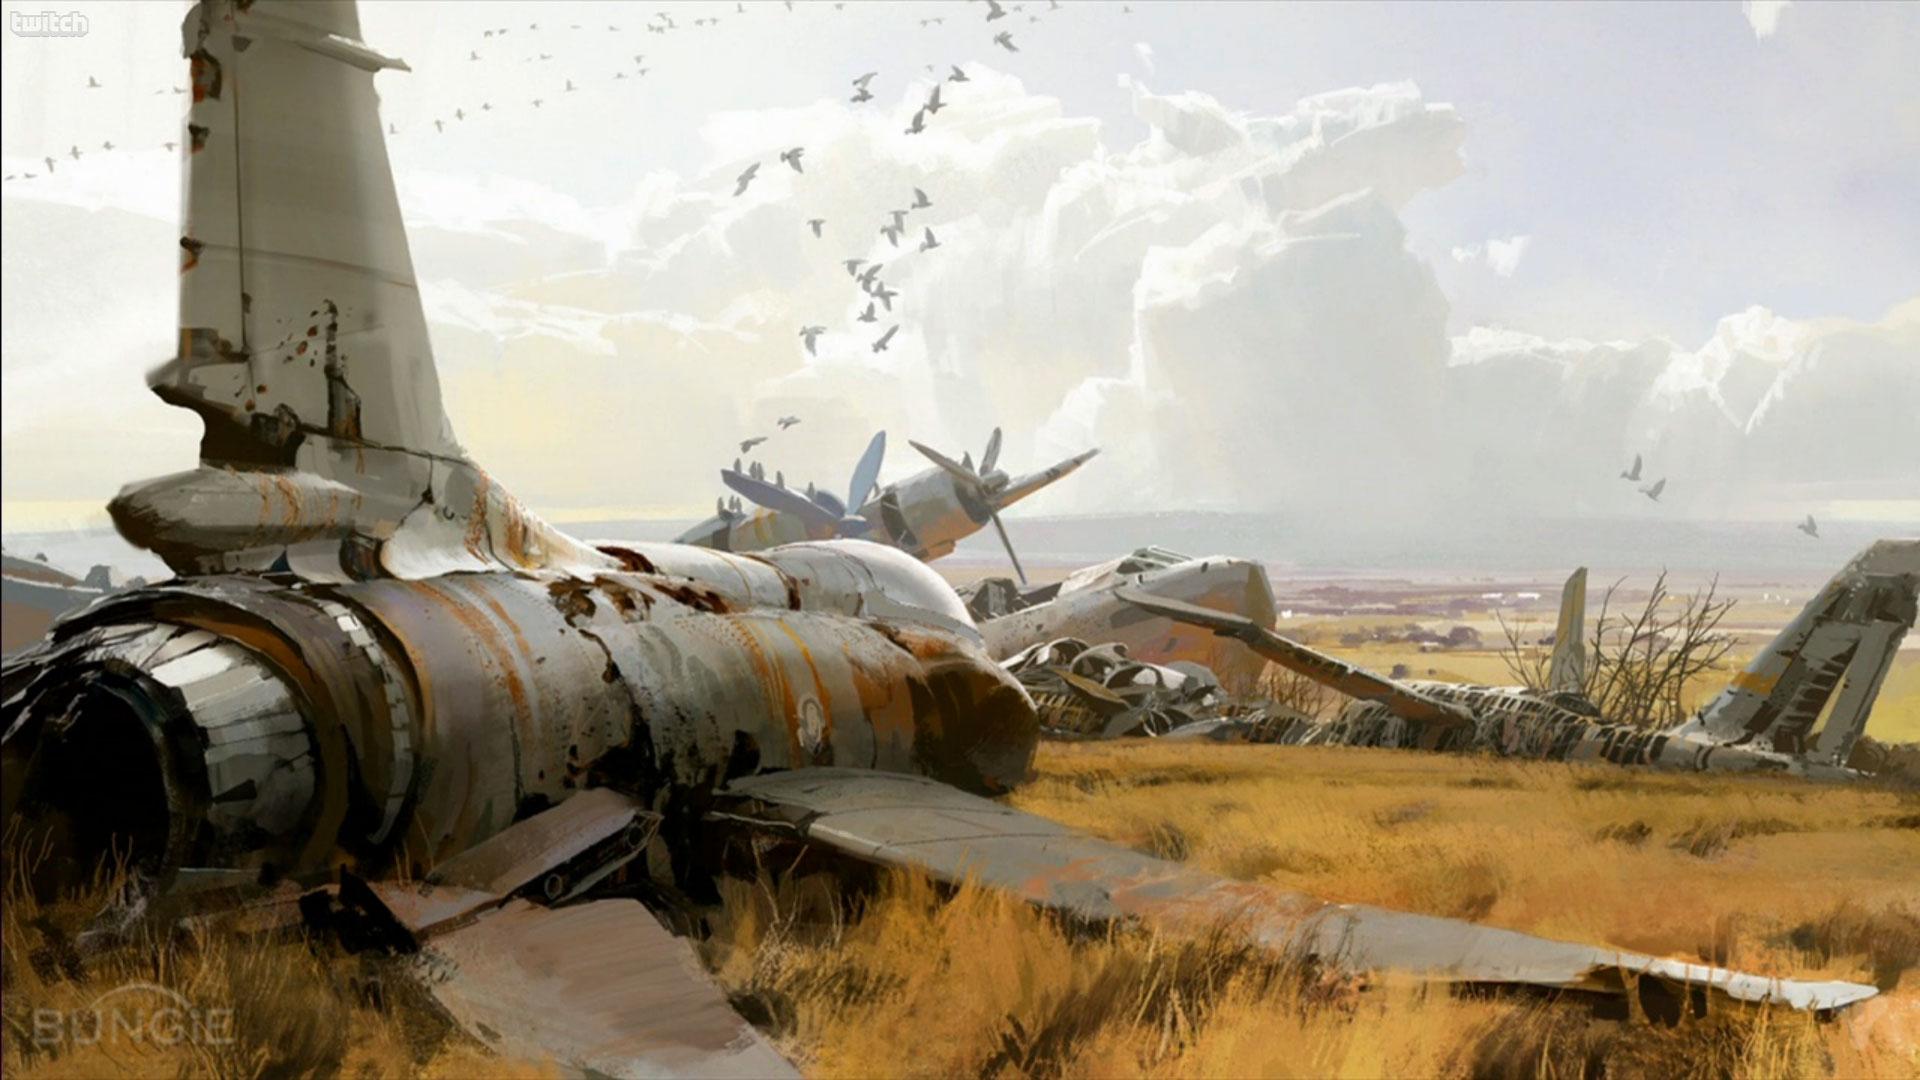 Activision, Bungie, Concept art, Destiny Game, Sci fi, Science fiction ...